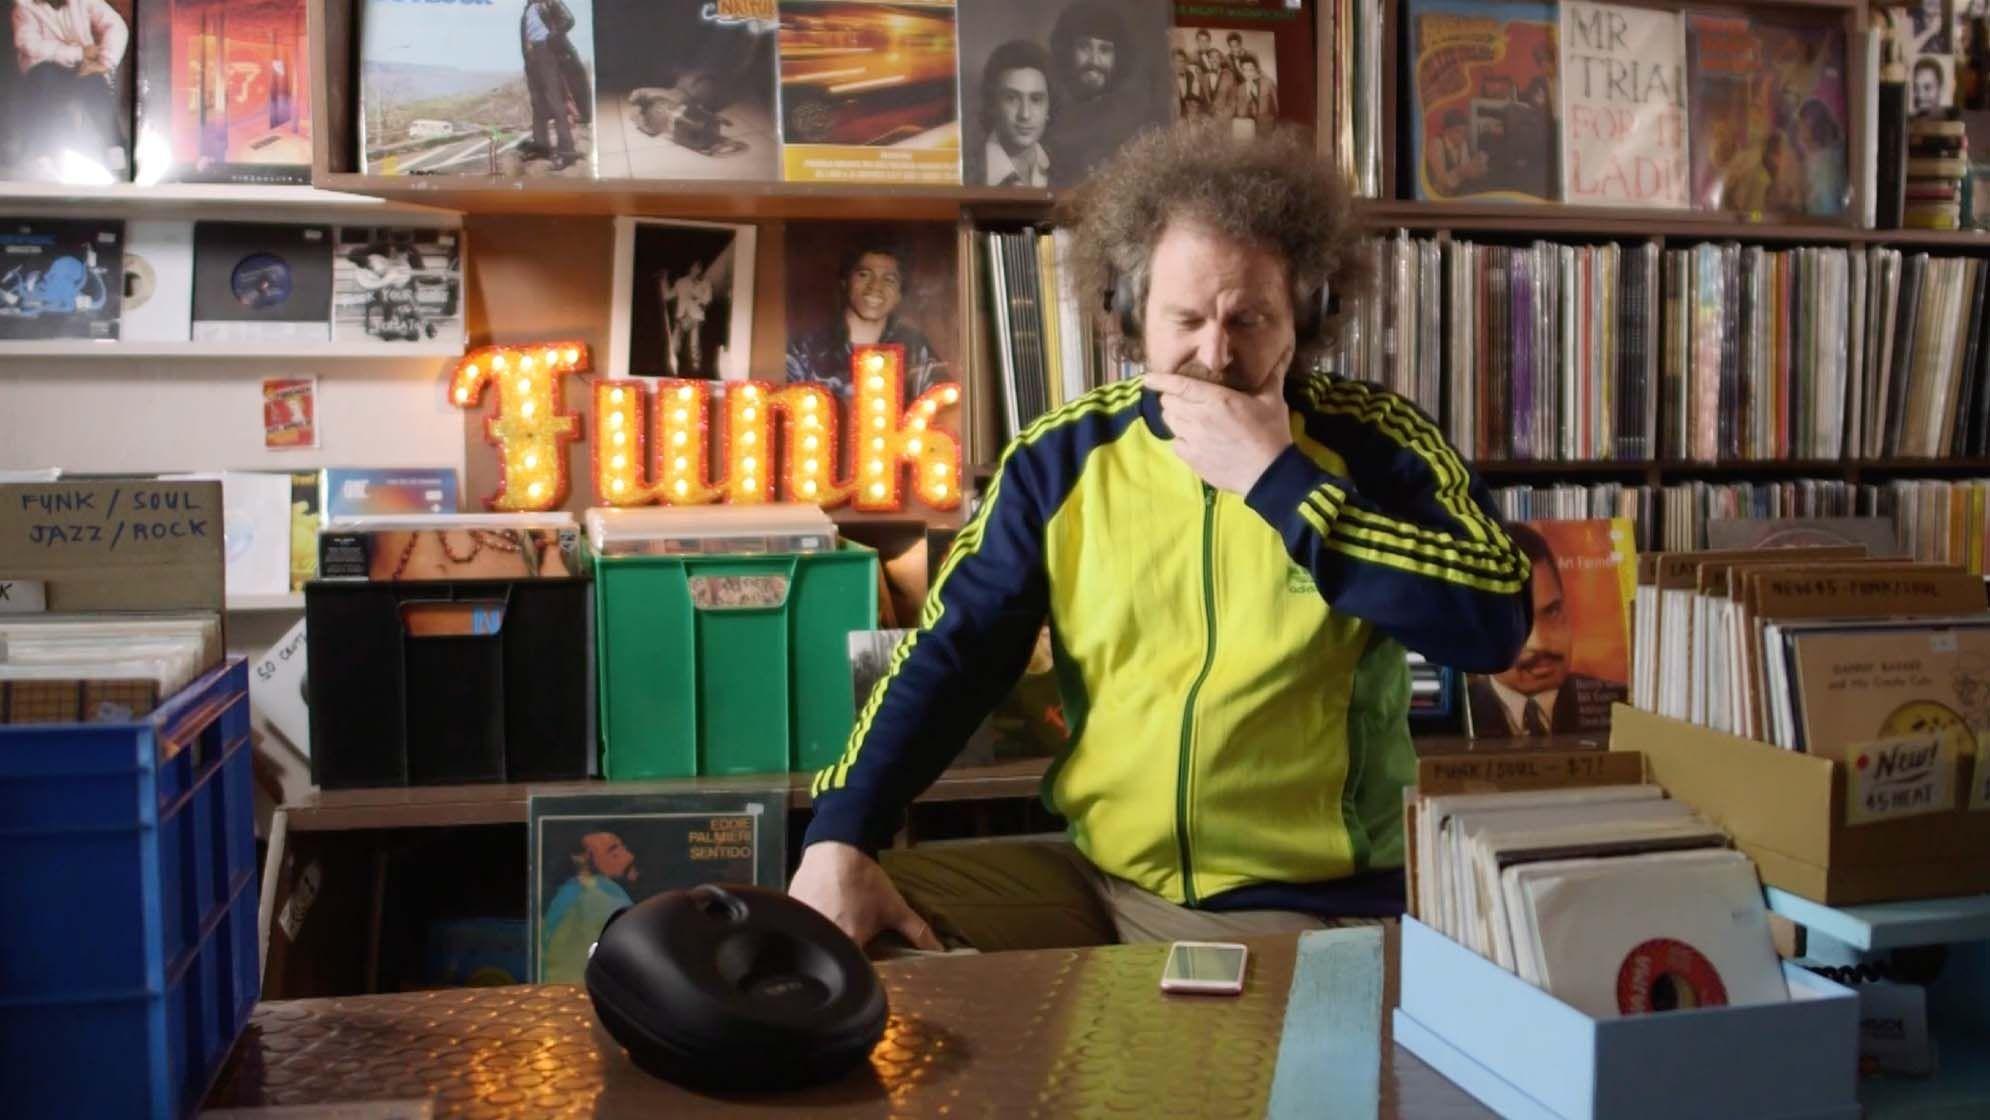 Chris Gill, film editor, reviewing the NURAPHONE headphones